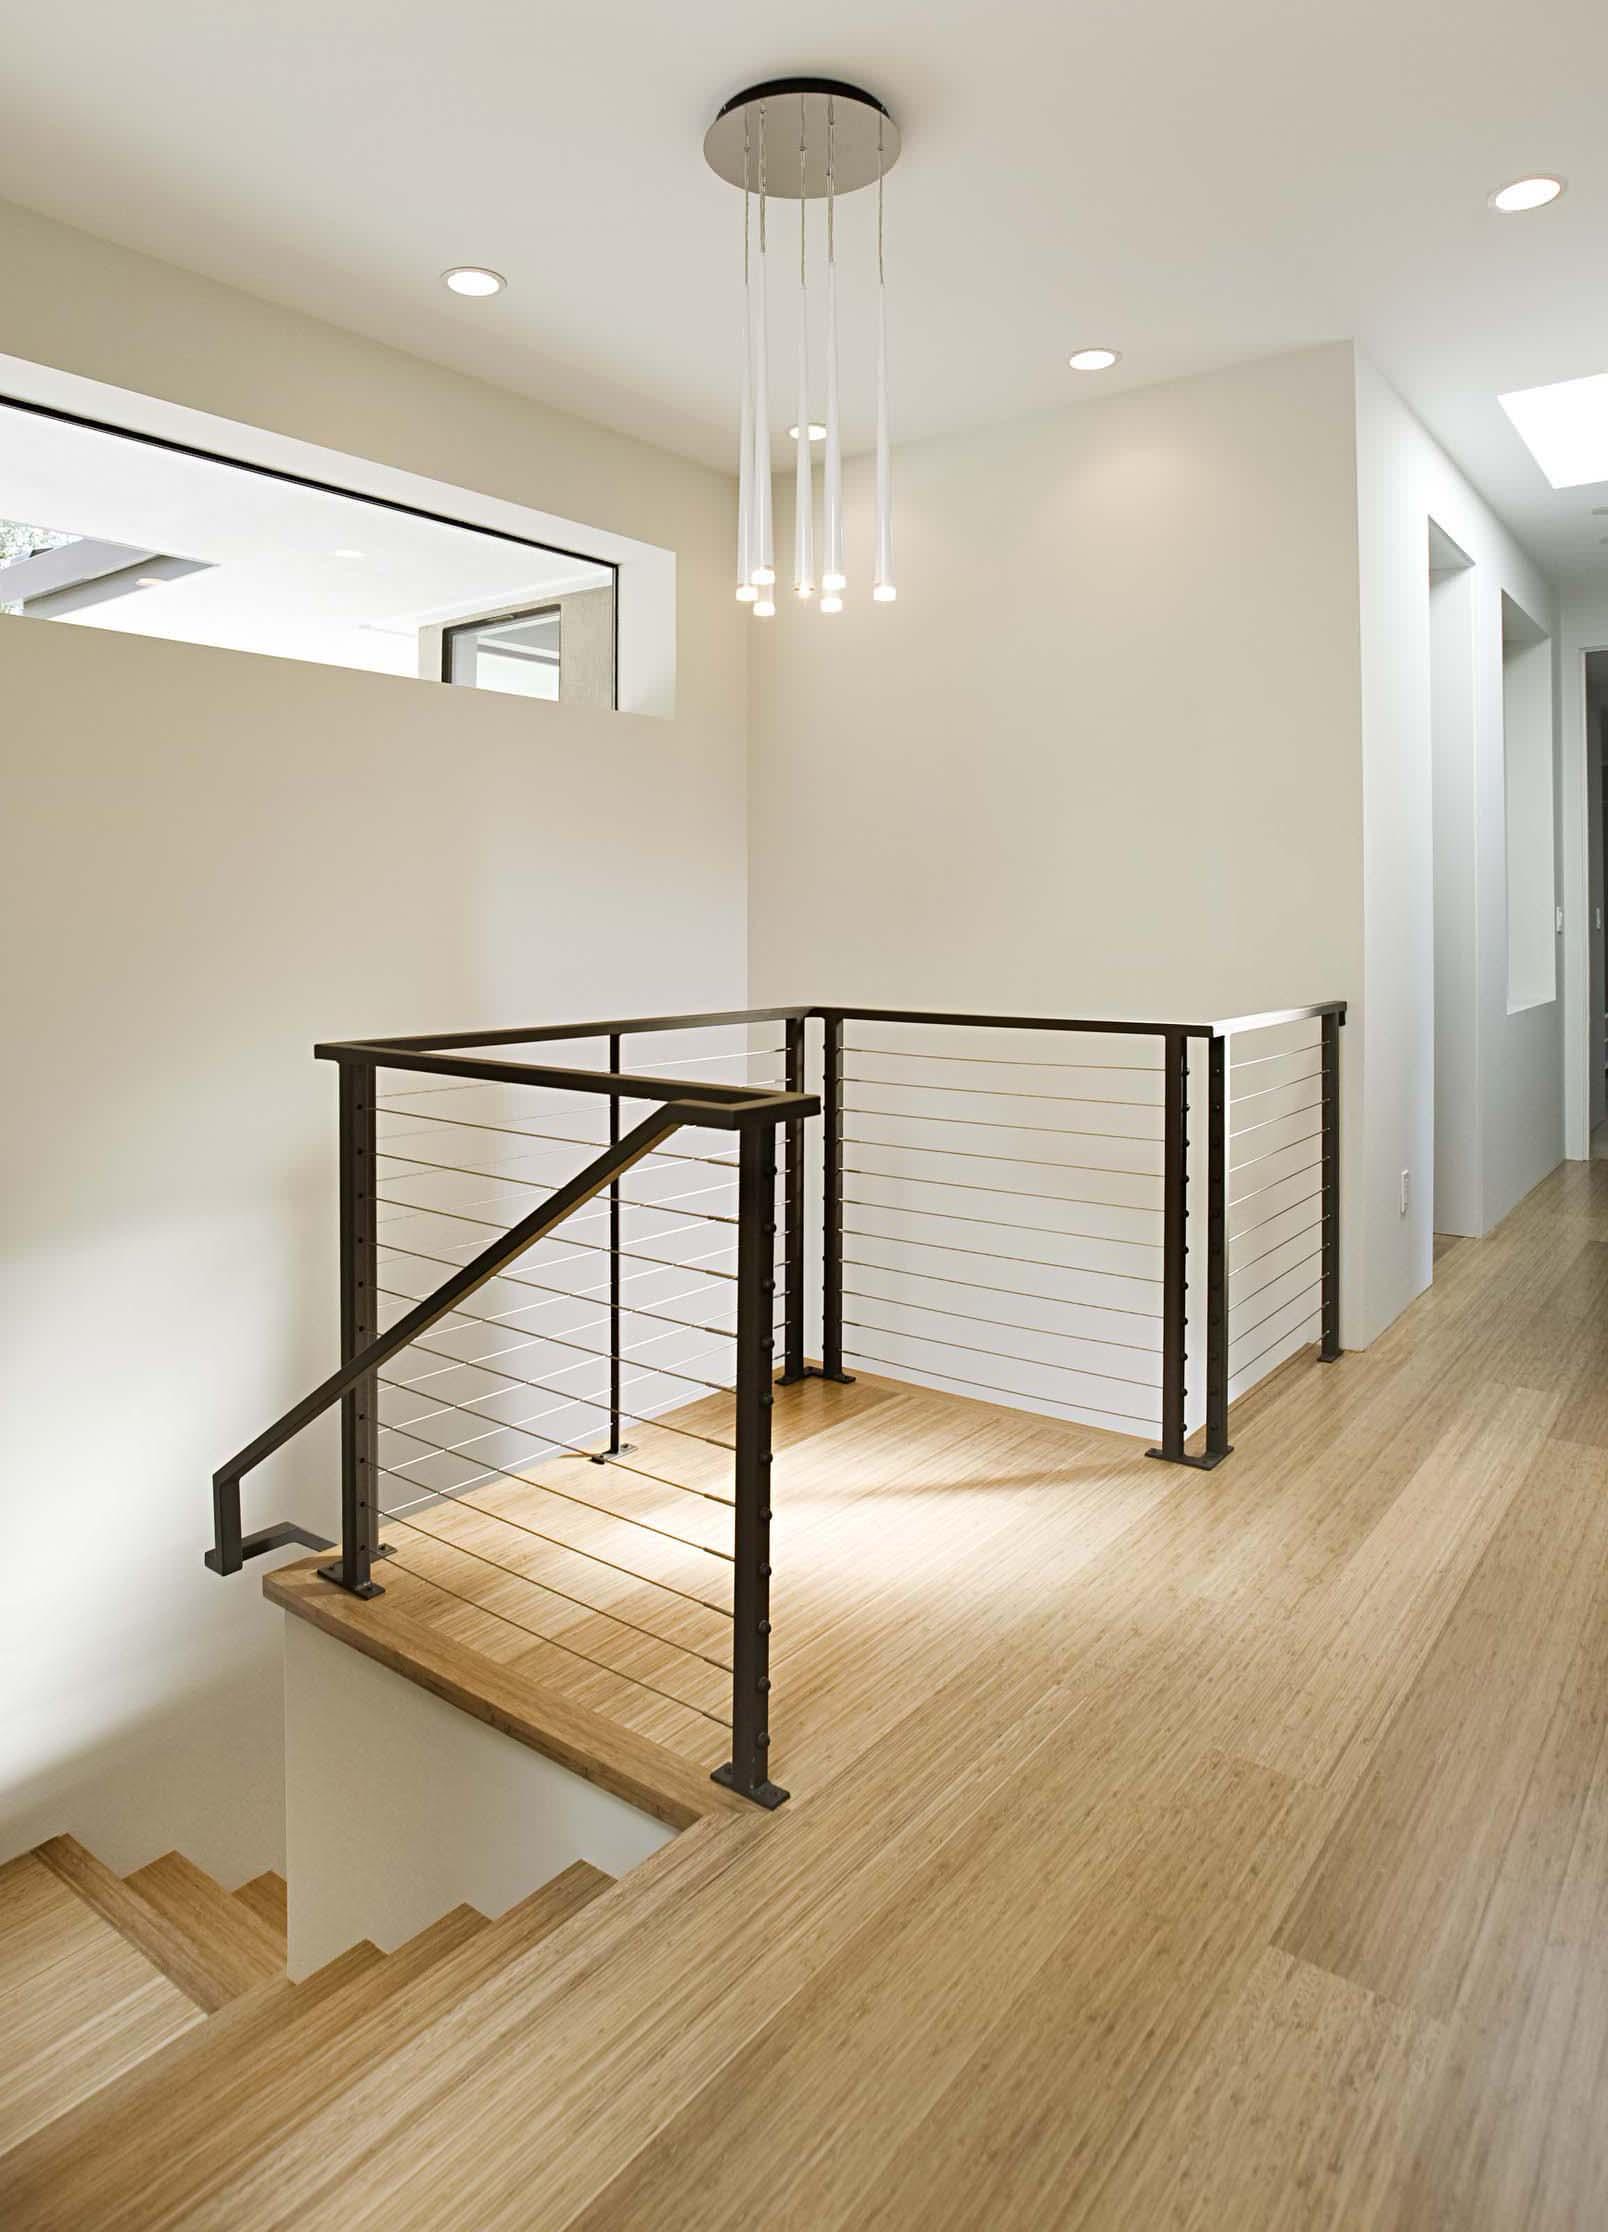 arriv e d 39 escalier contemporain garde corps net. Black Bedroom Furniture Sets. Home Design Ideas